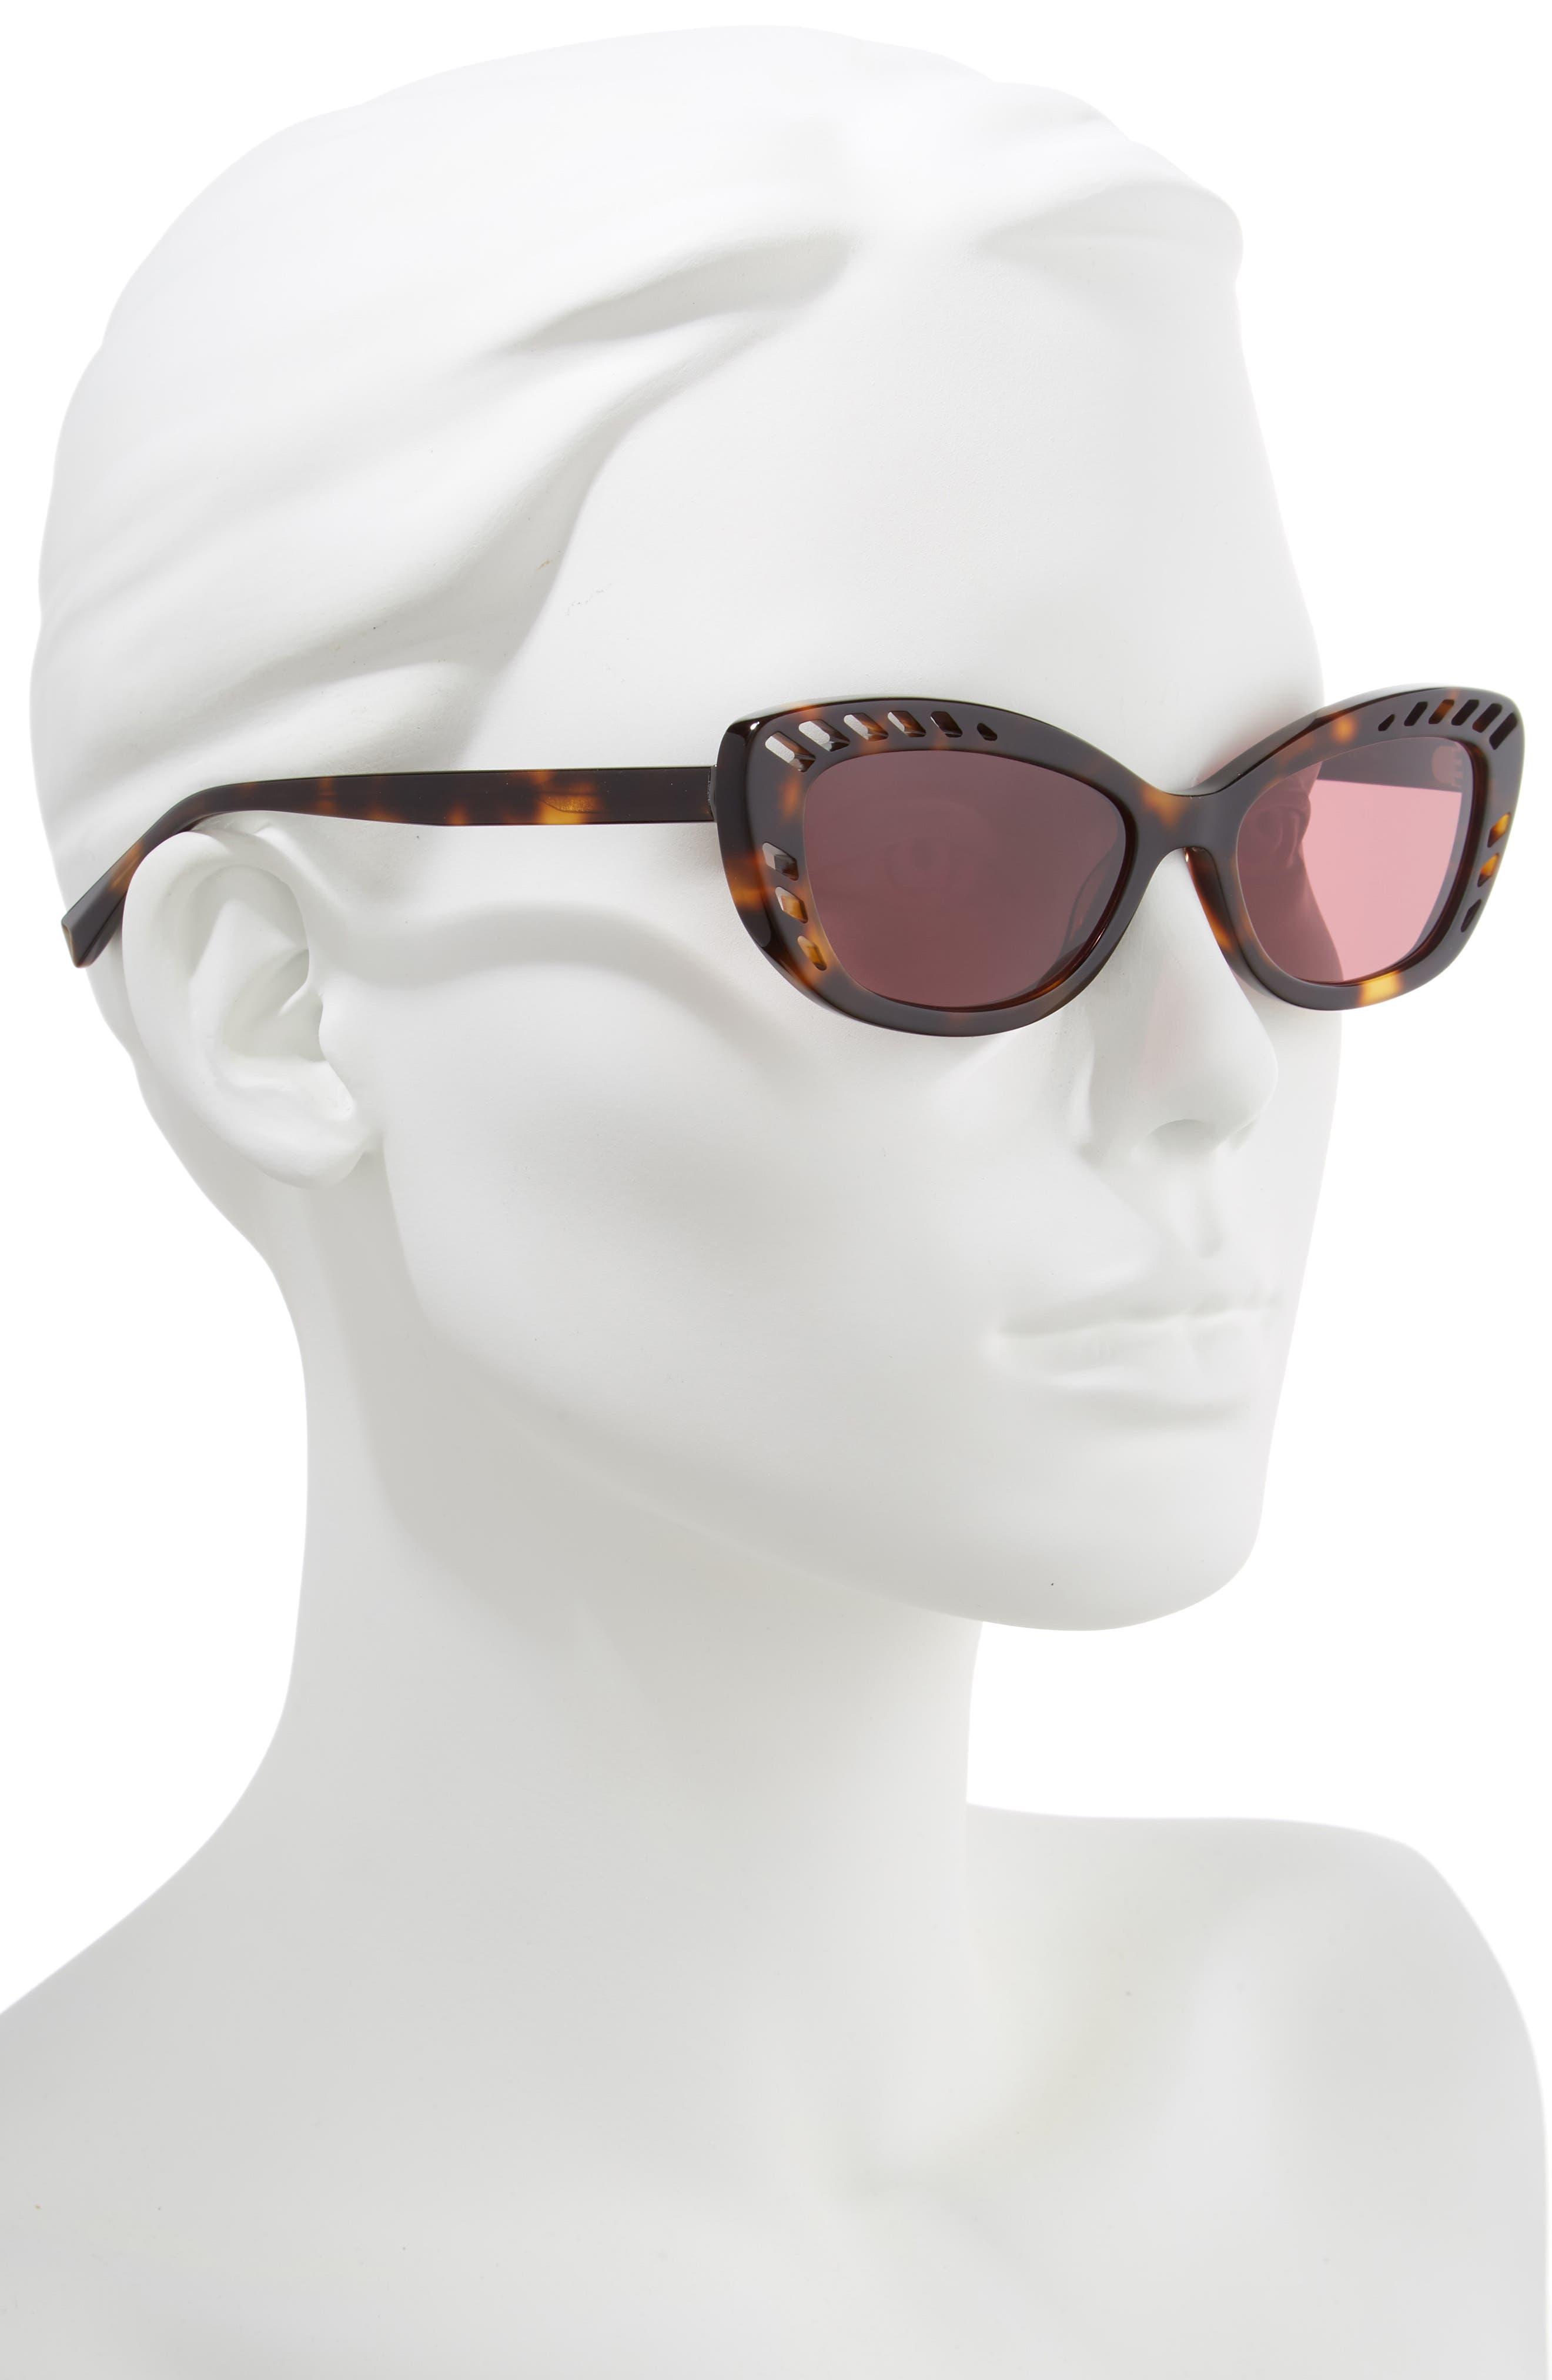 fd947a4f5b5 KENDALL + KYLIE Sunglasses for Women